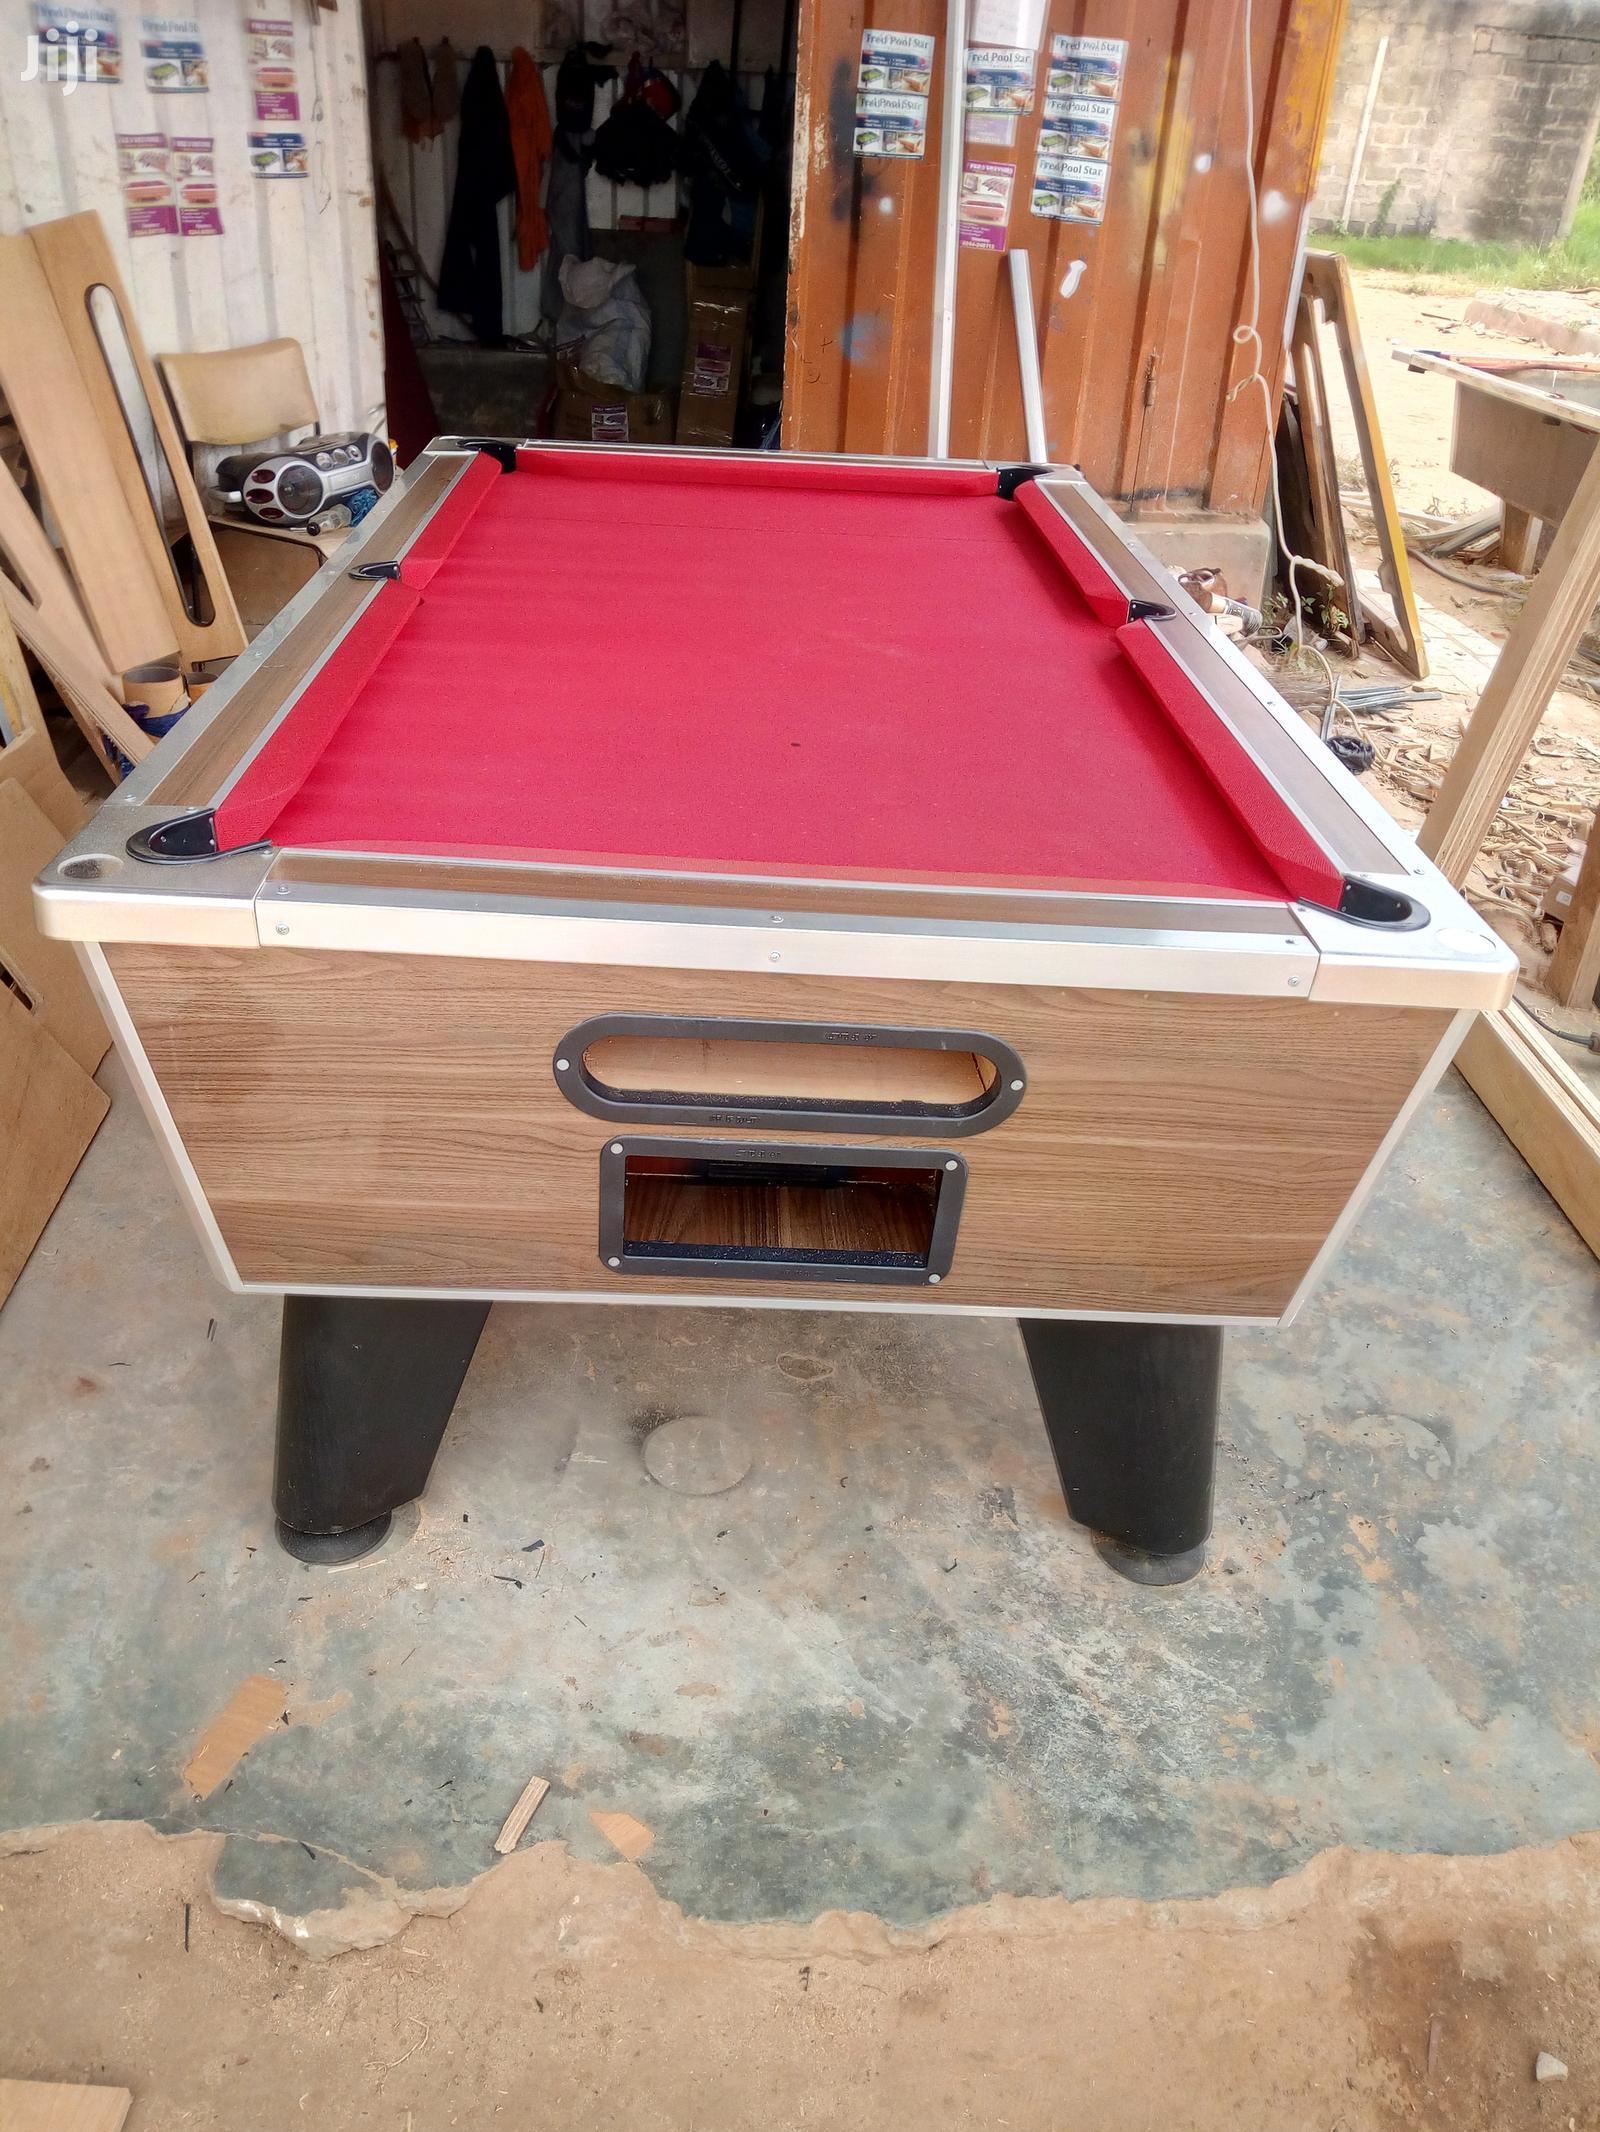 Marble Snooker 🎱 Boardo | Sports Equipment for sale in Dansoman, Greater Accra, Ghana